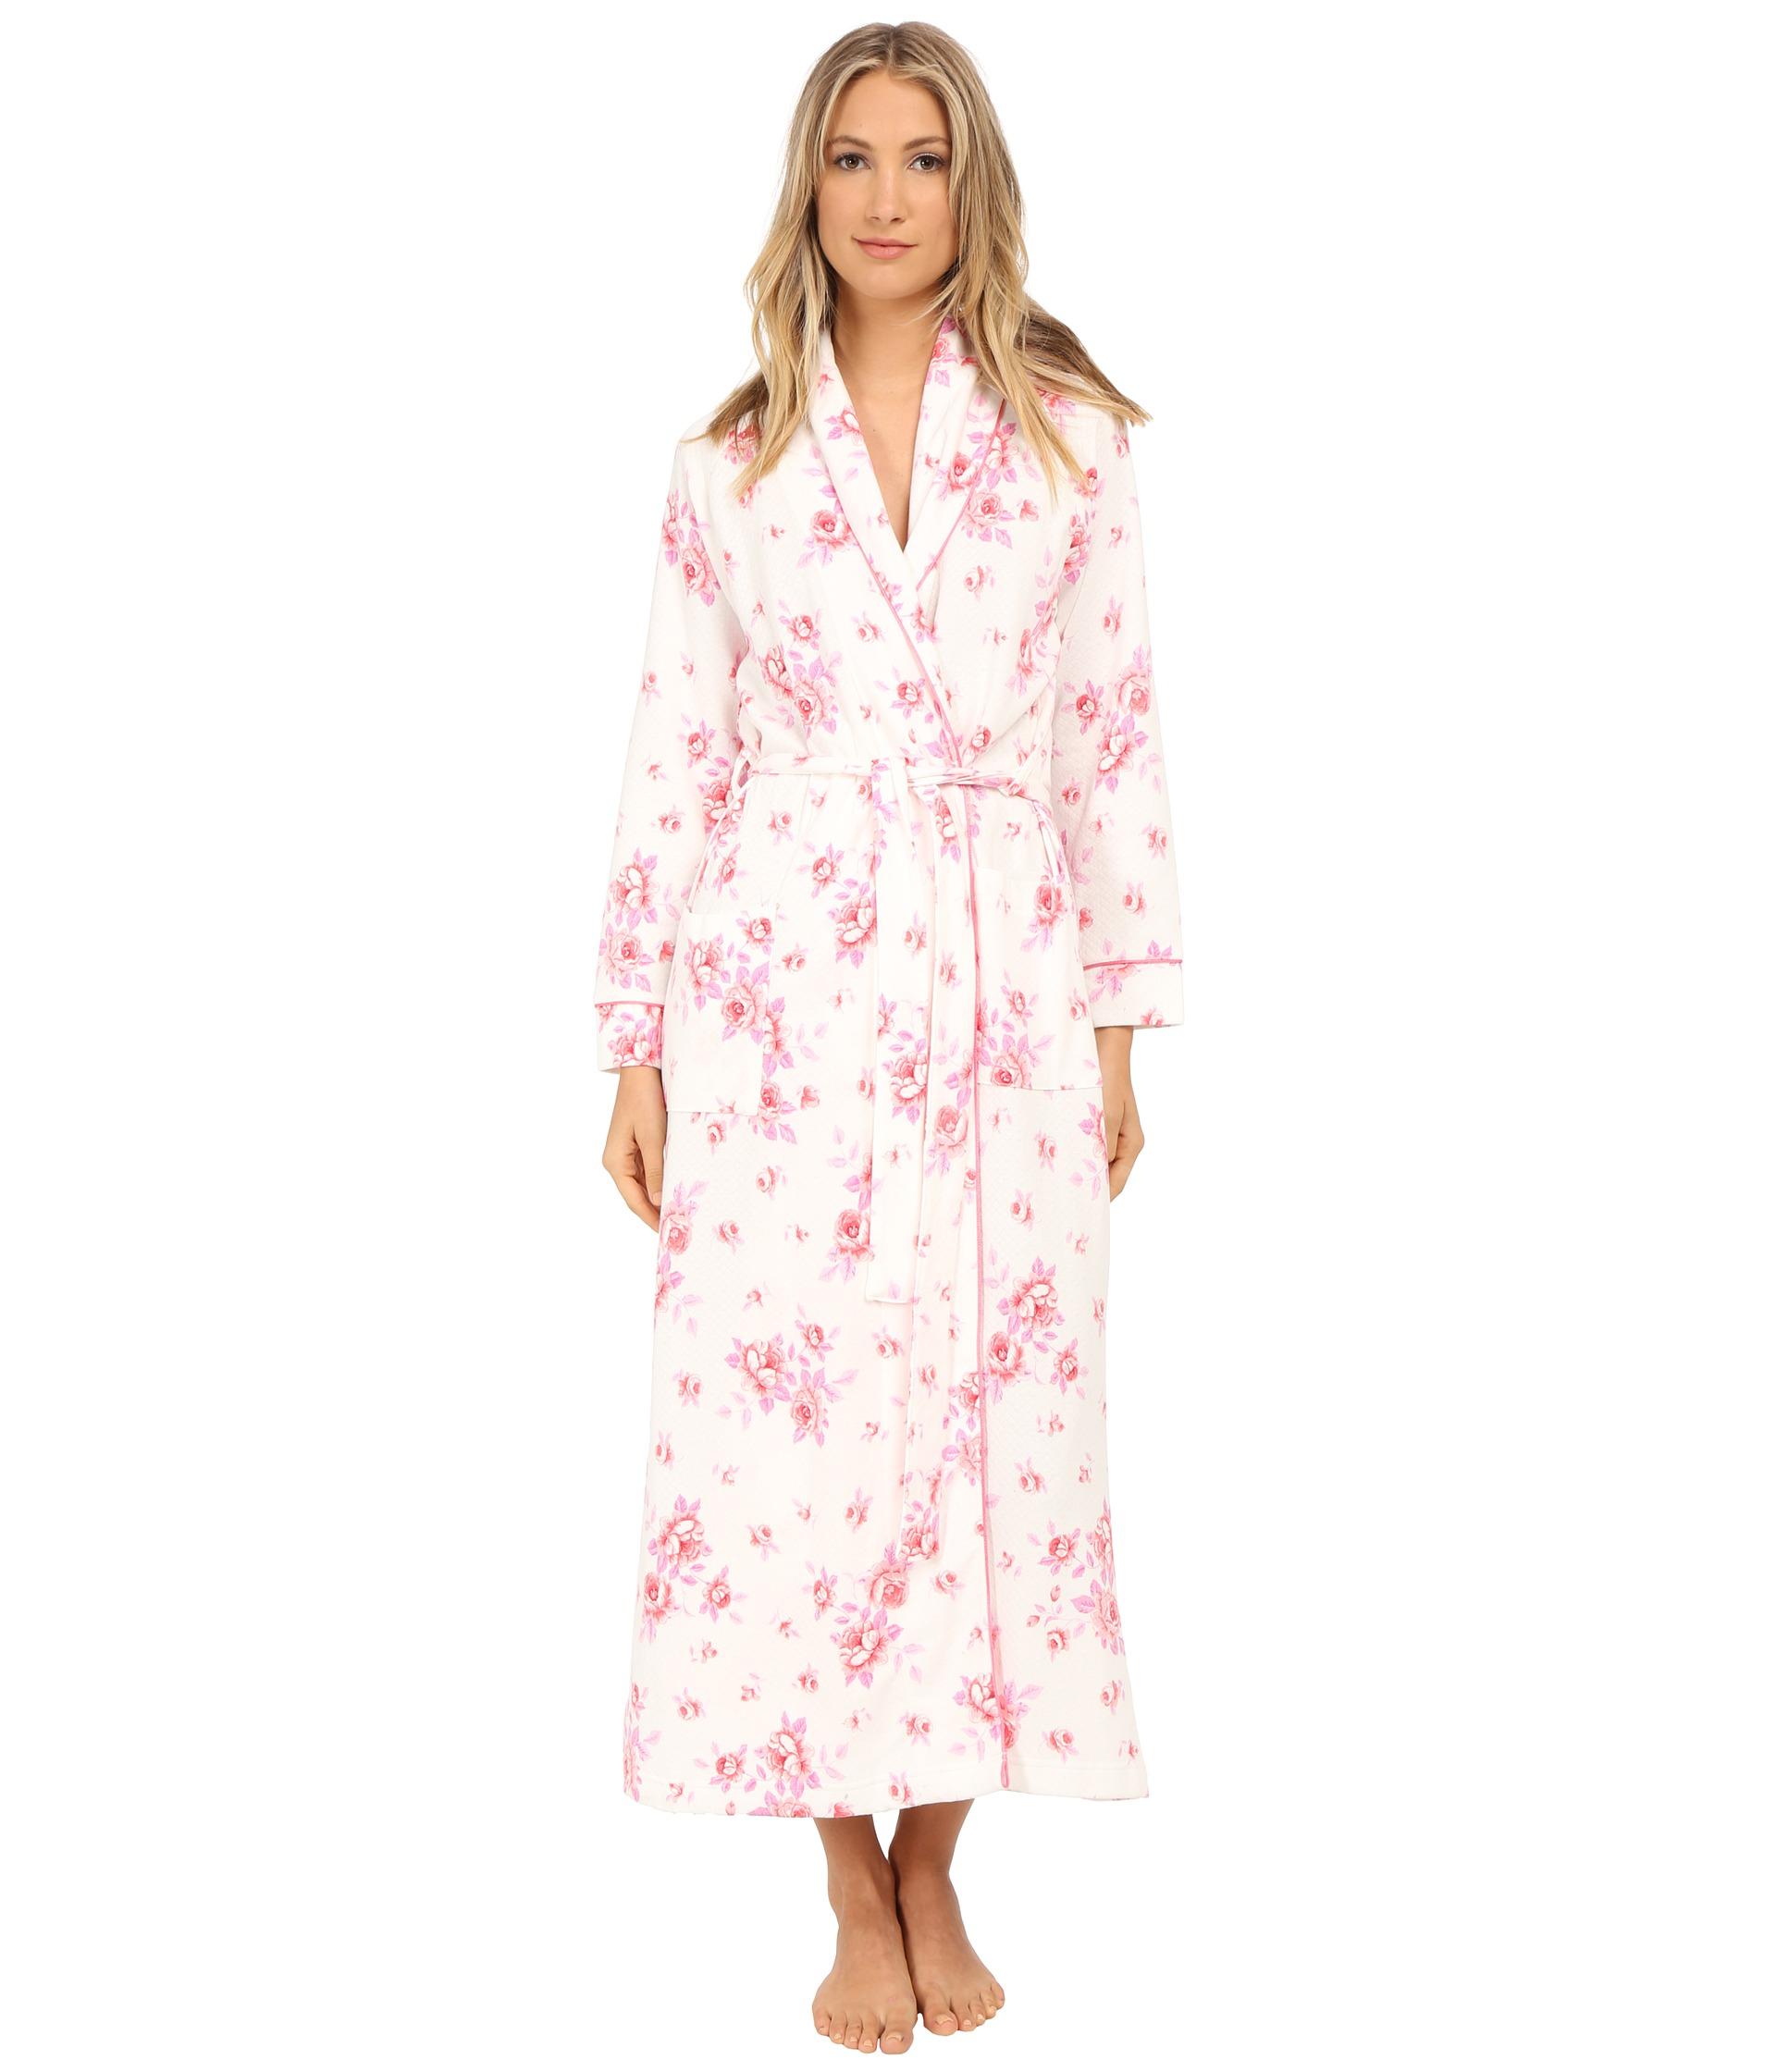 9a7adba55de1 Carole Hochman Diamond Quilted Floral Robe - Lyst